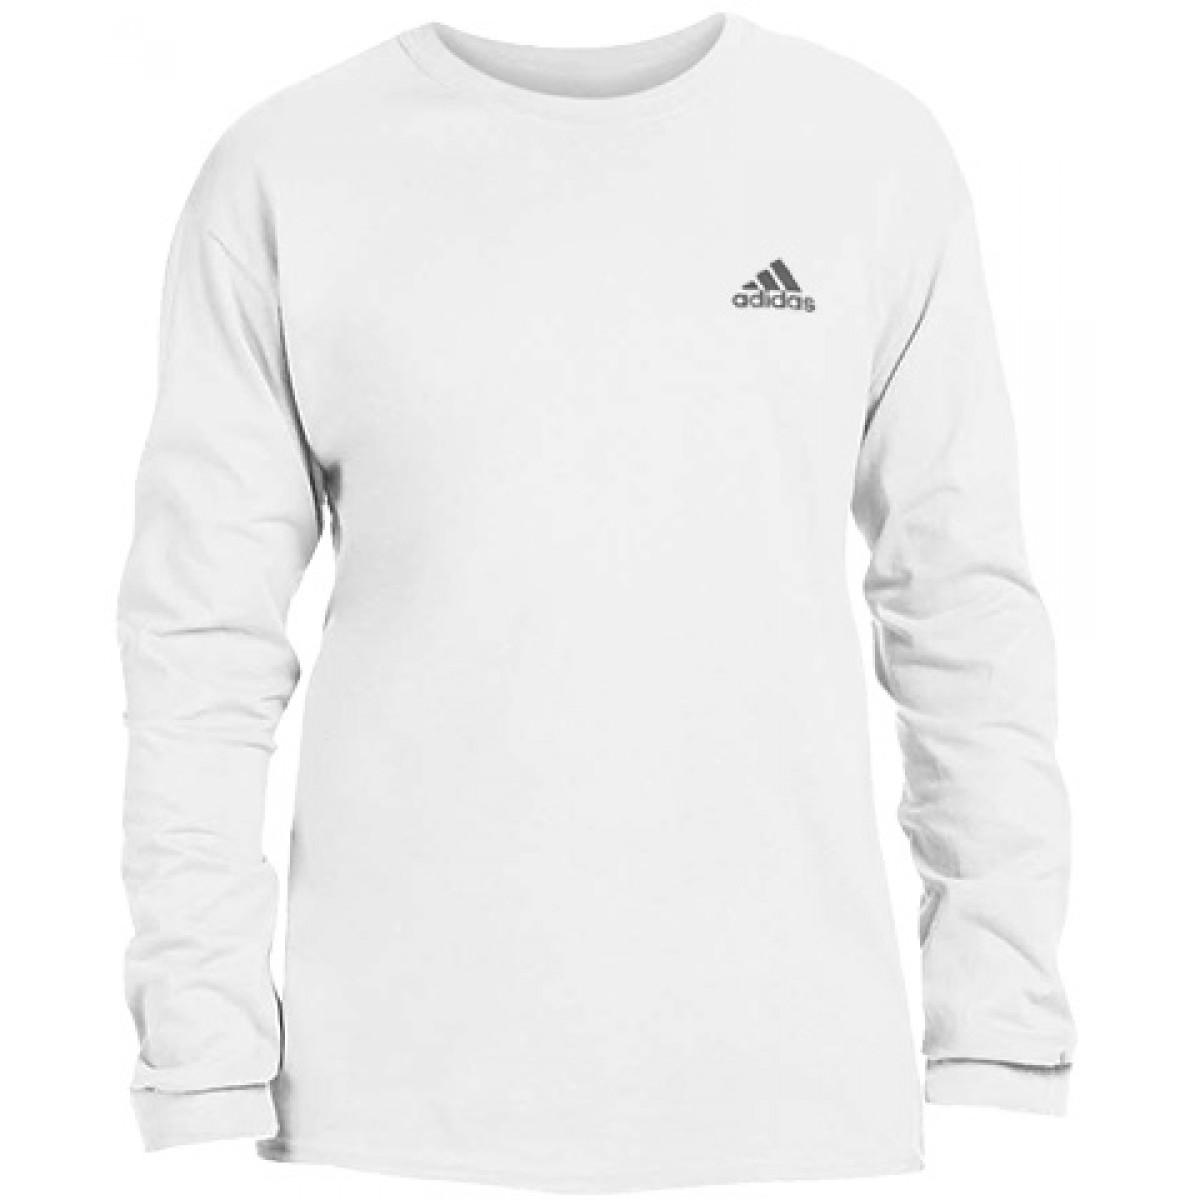 Men's Ultimate Long Sleeve Adidas Crew Tee-White-M